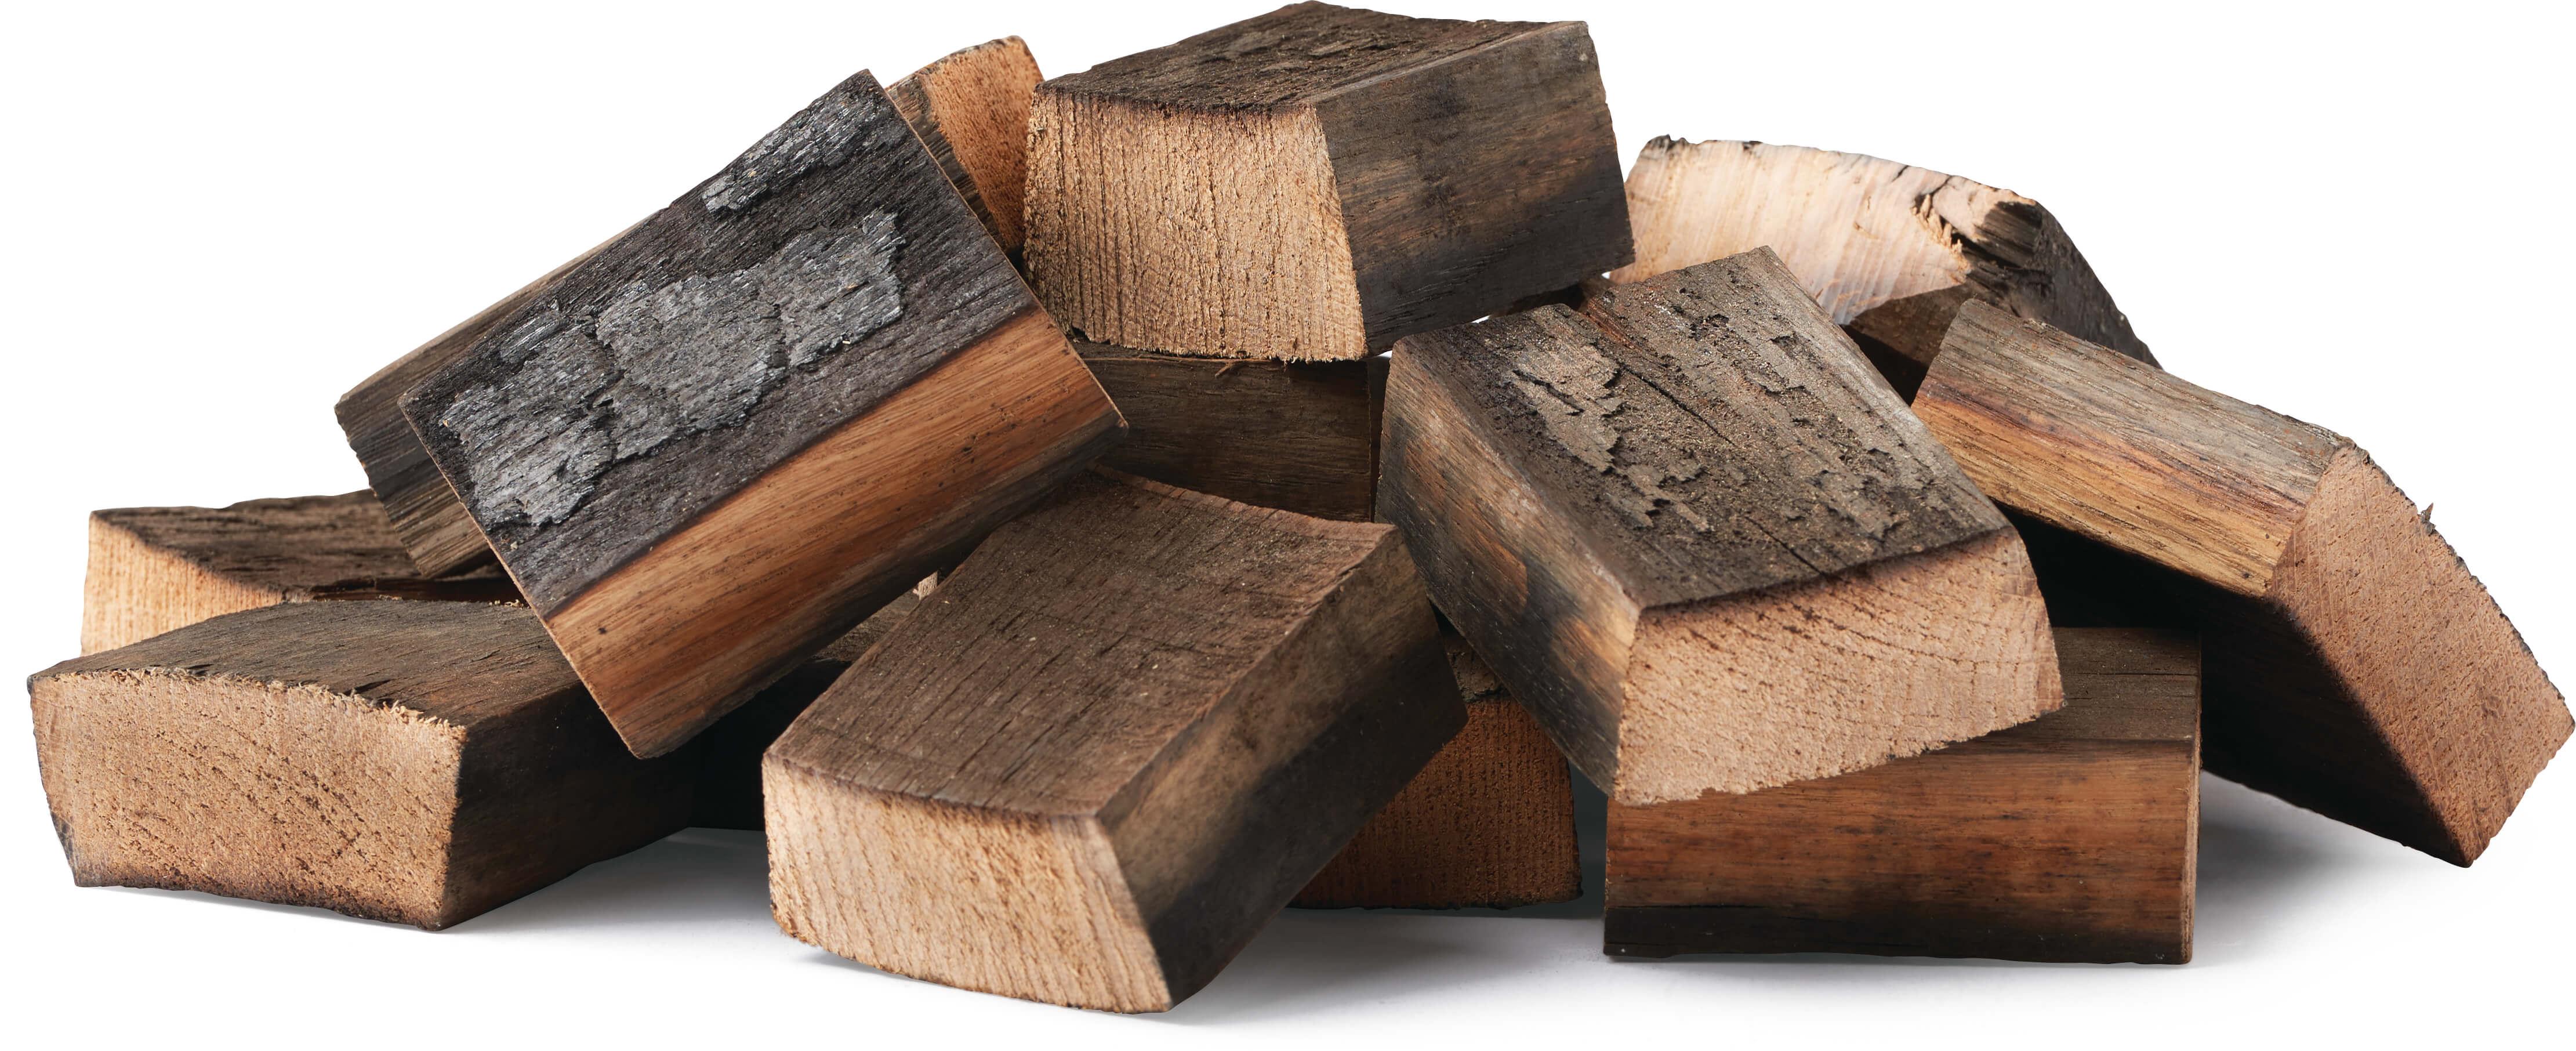 Brandy Barrel Chunks